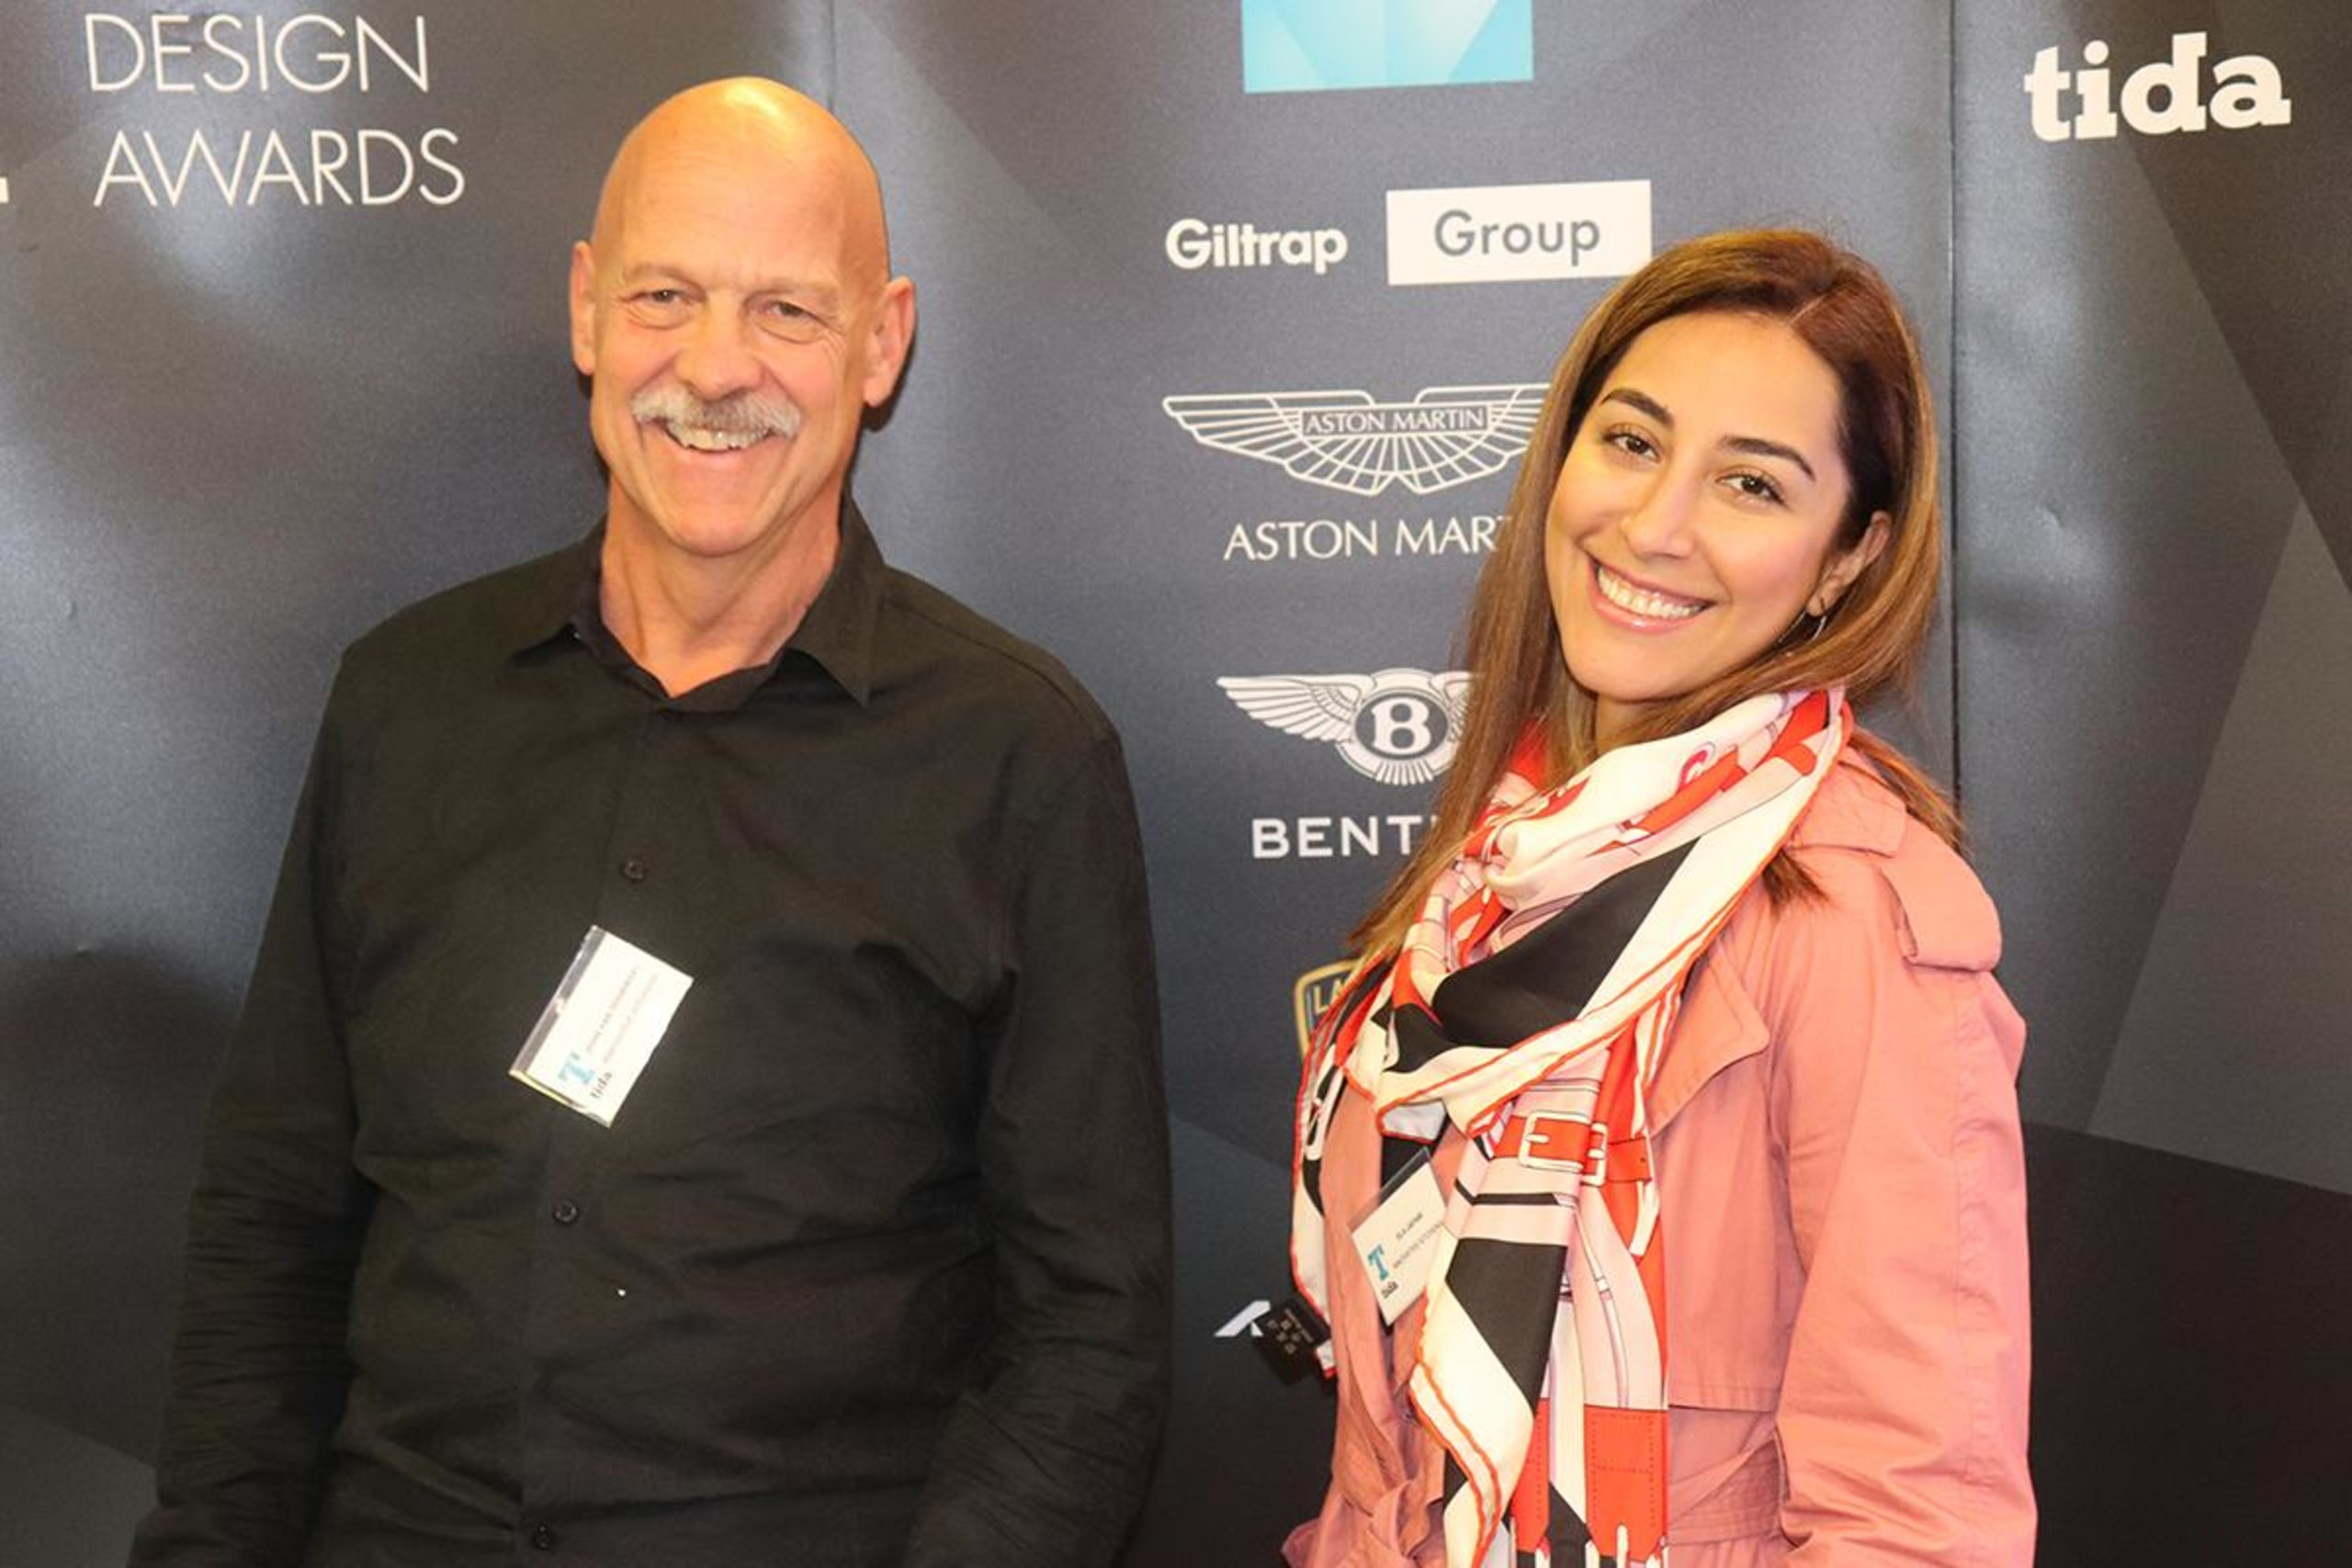 John van Doormaal and Pam Louis from Innovative award, event, product, black, gray